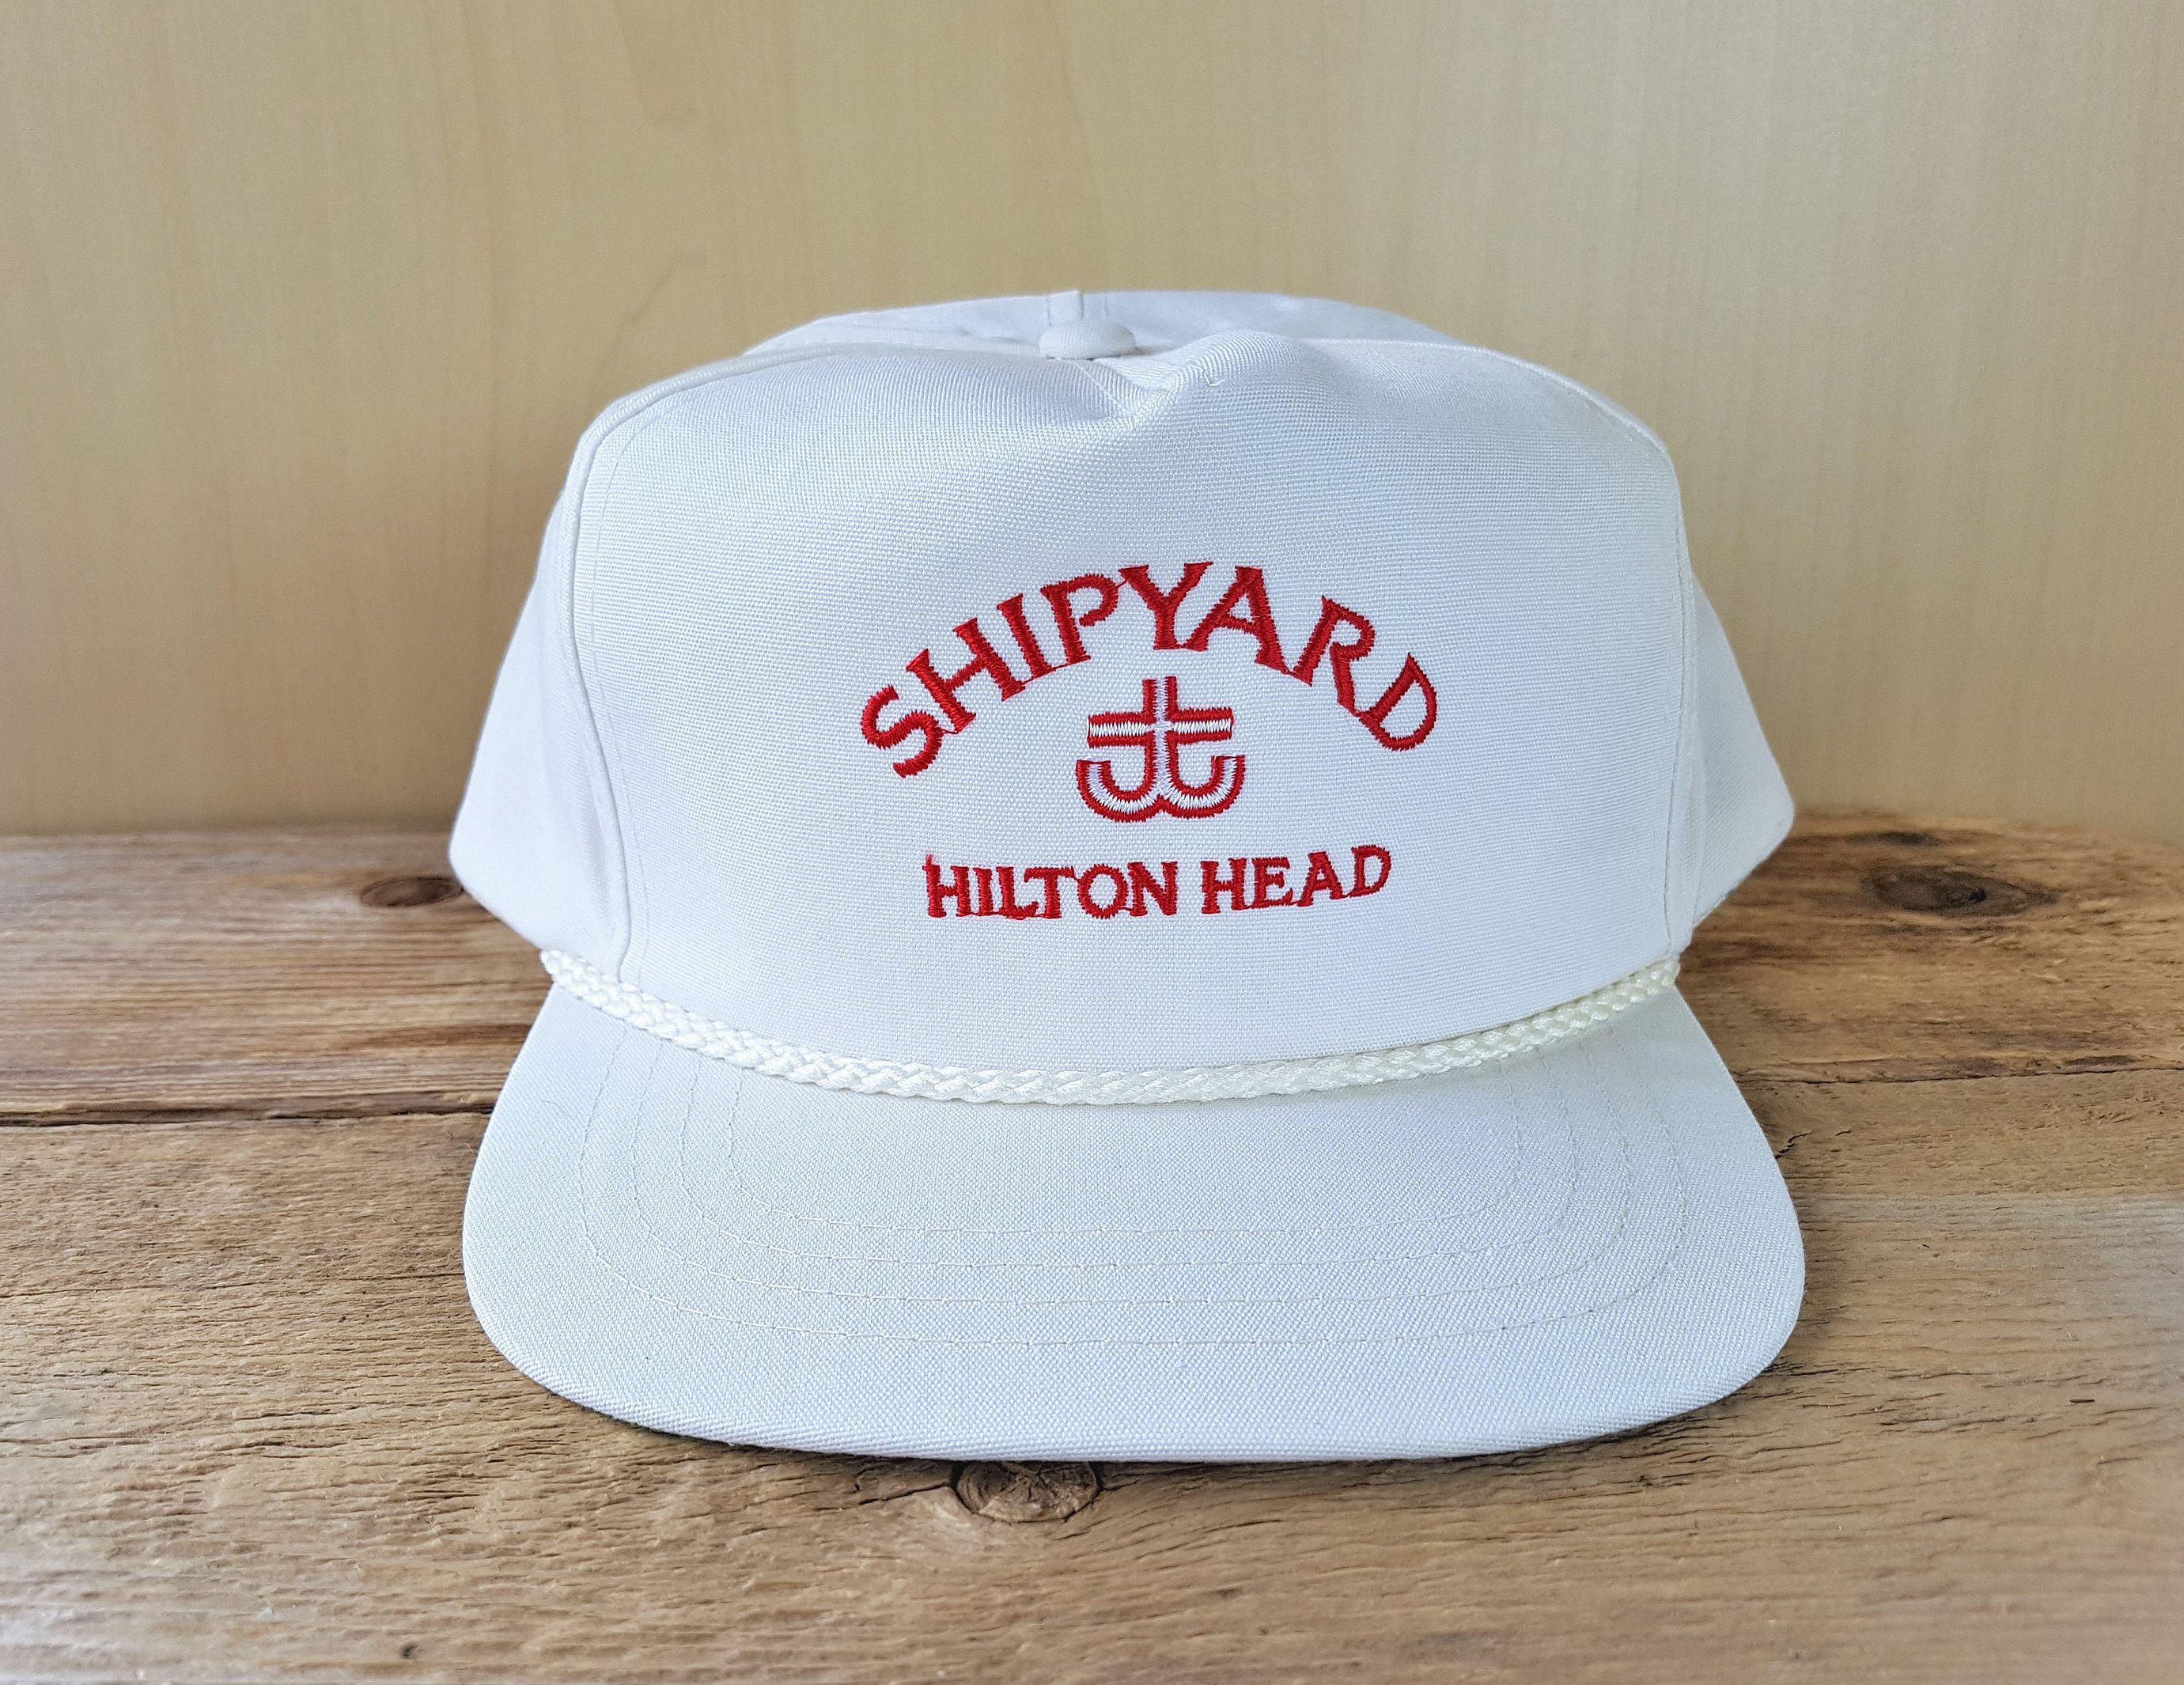 Shipyard Hilton Head Vintage White Strapback Golf Hat Rope Etsy White Vintage Golf Hats Hilton Head